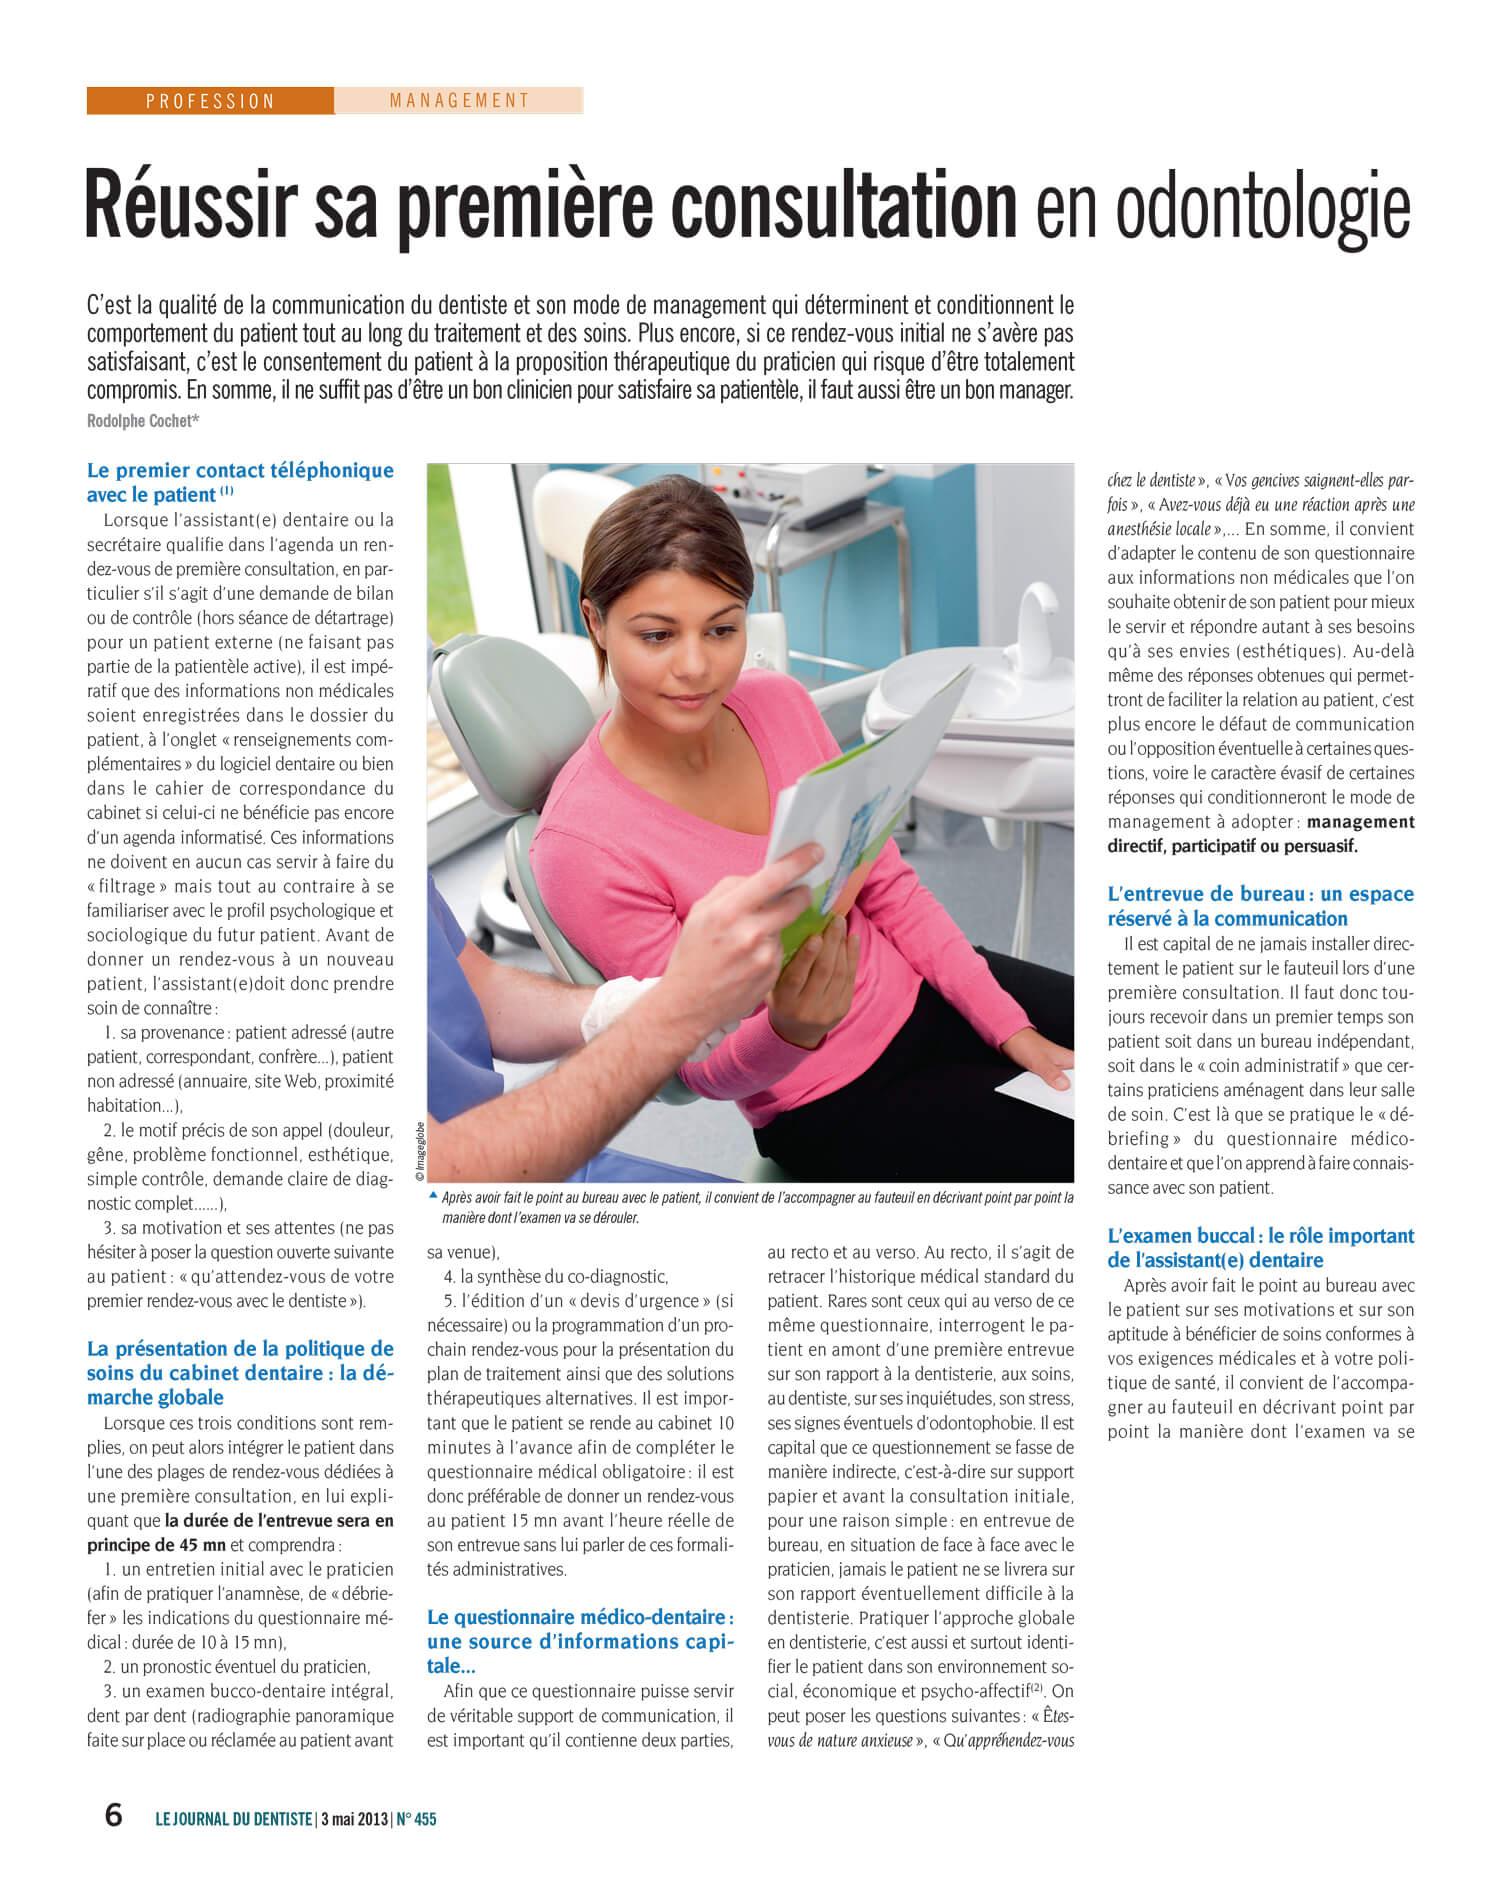 reussir-rendez-vous-bilan-consultation-dentiste-cabinet-dentaire-belgique-rodolphe-cochet.jpg